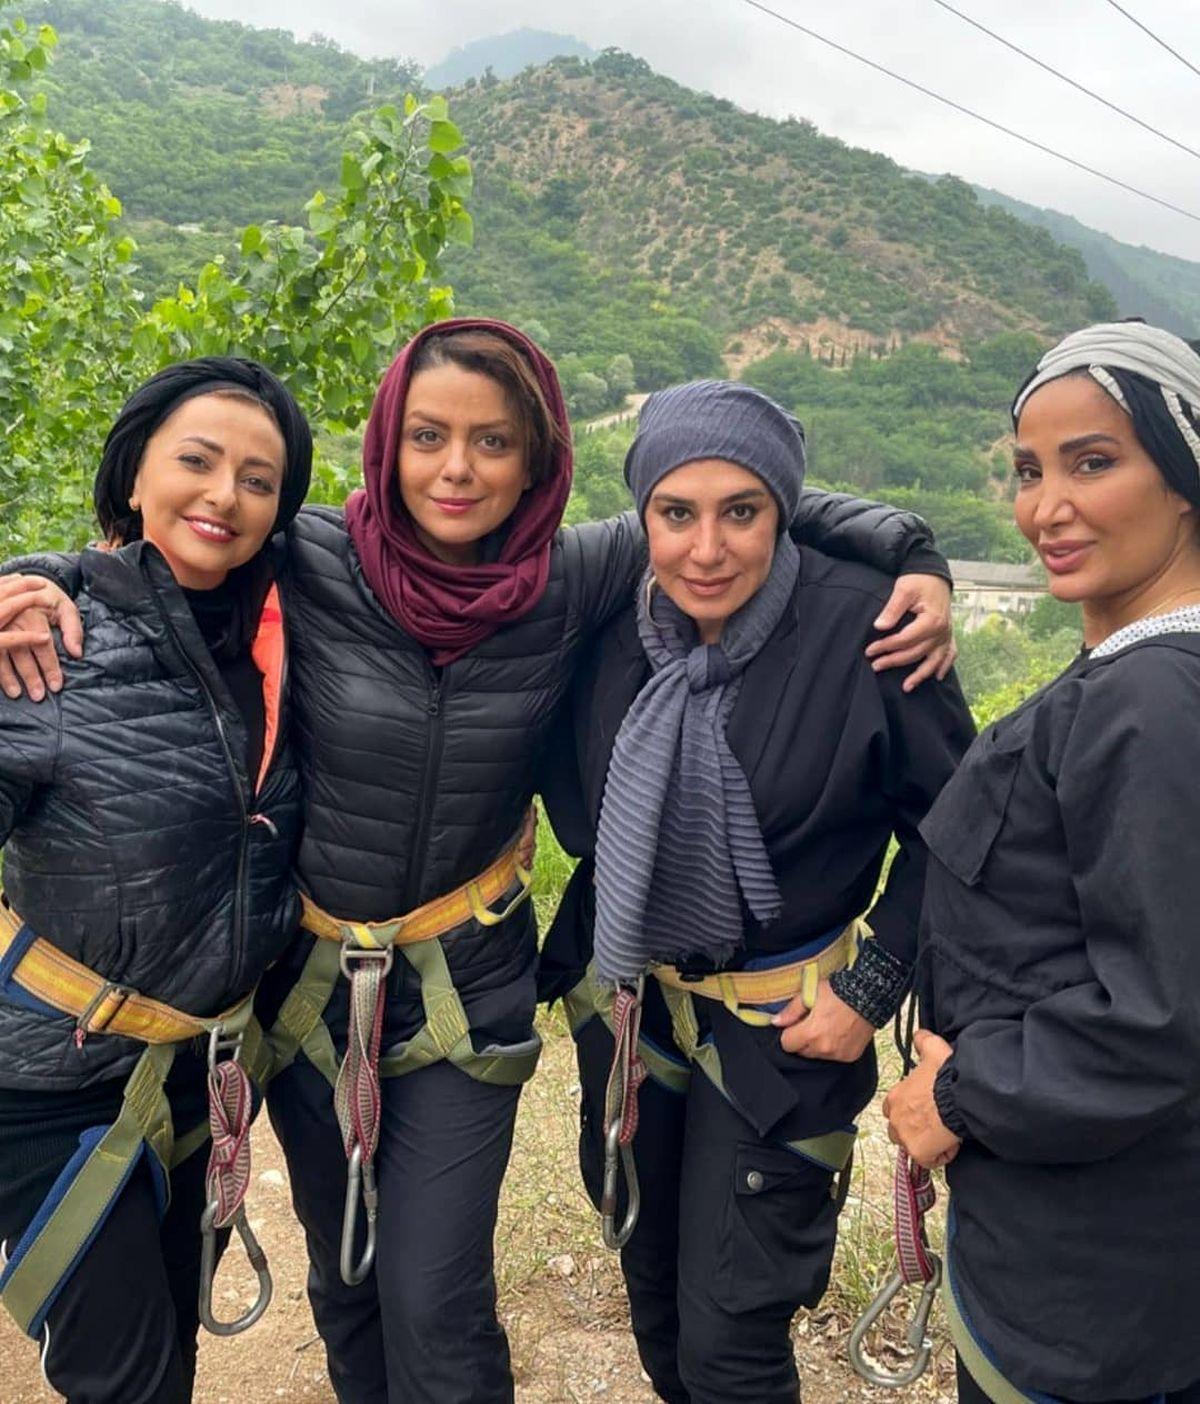 تیپ آنچنانی نسیم ادبی و نفیسه روشن هنگام کوهنوردی/عکس